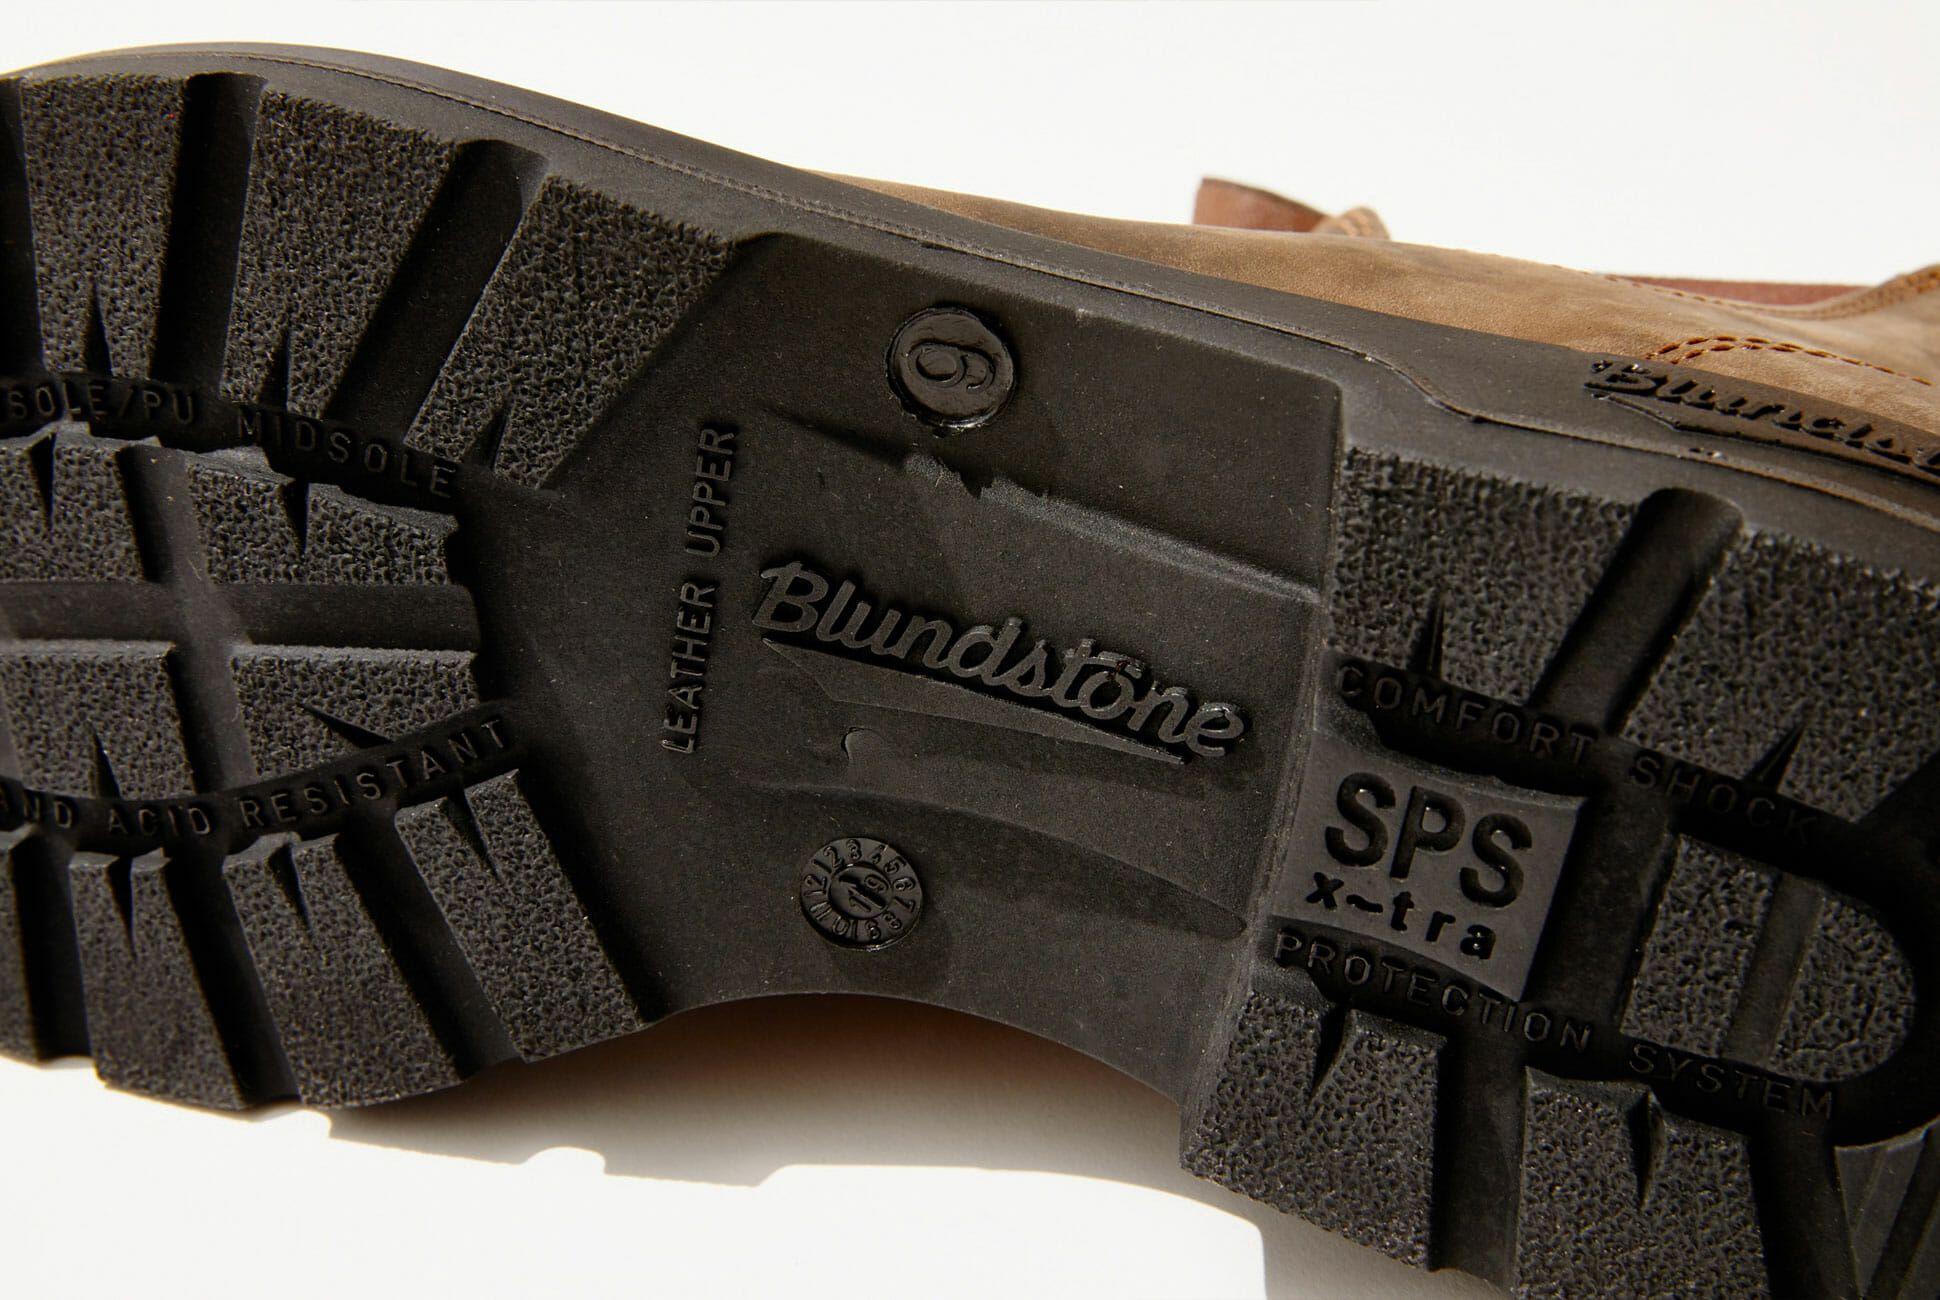 Blundstone-Weekend-Carry-Gear-Patrol-hero-product-4